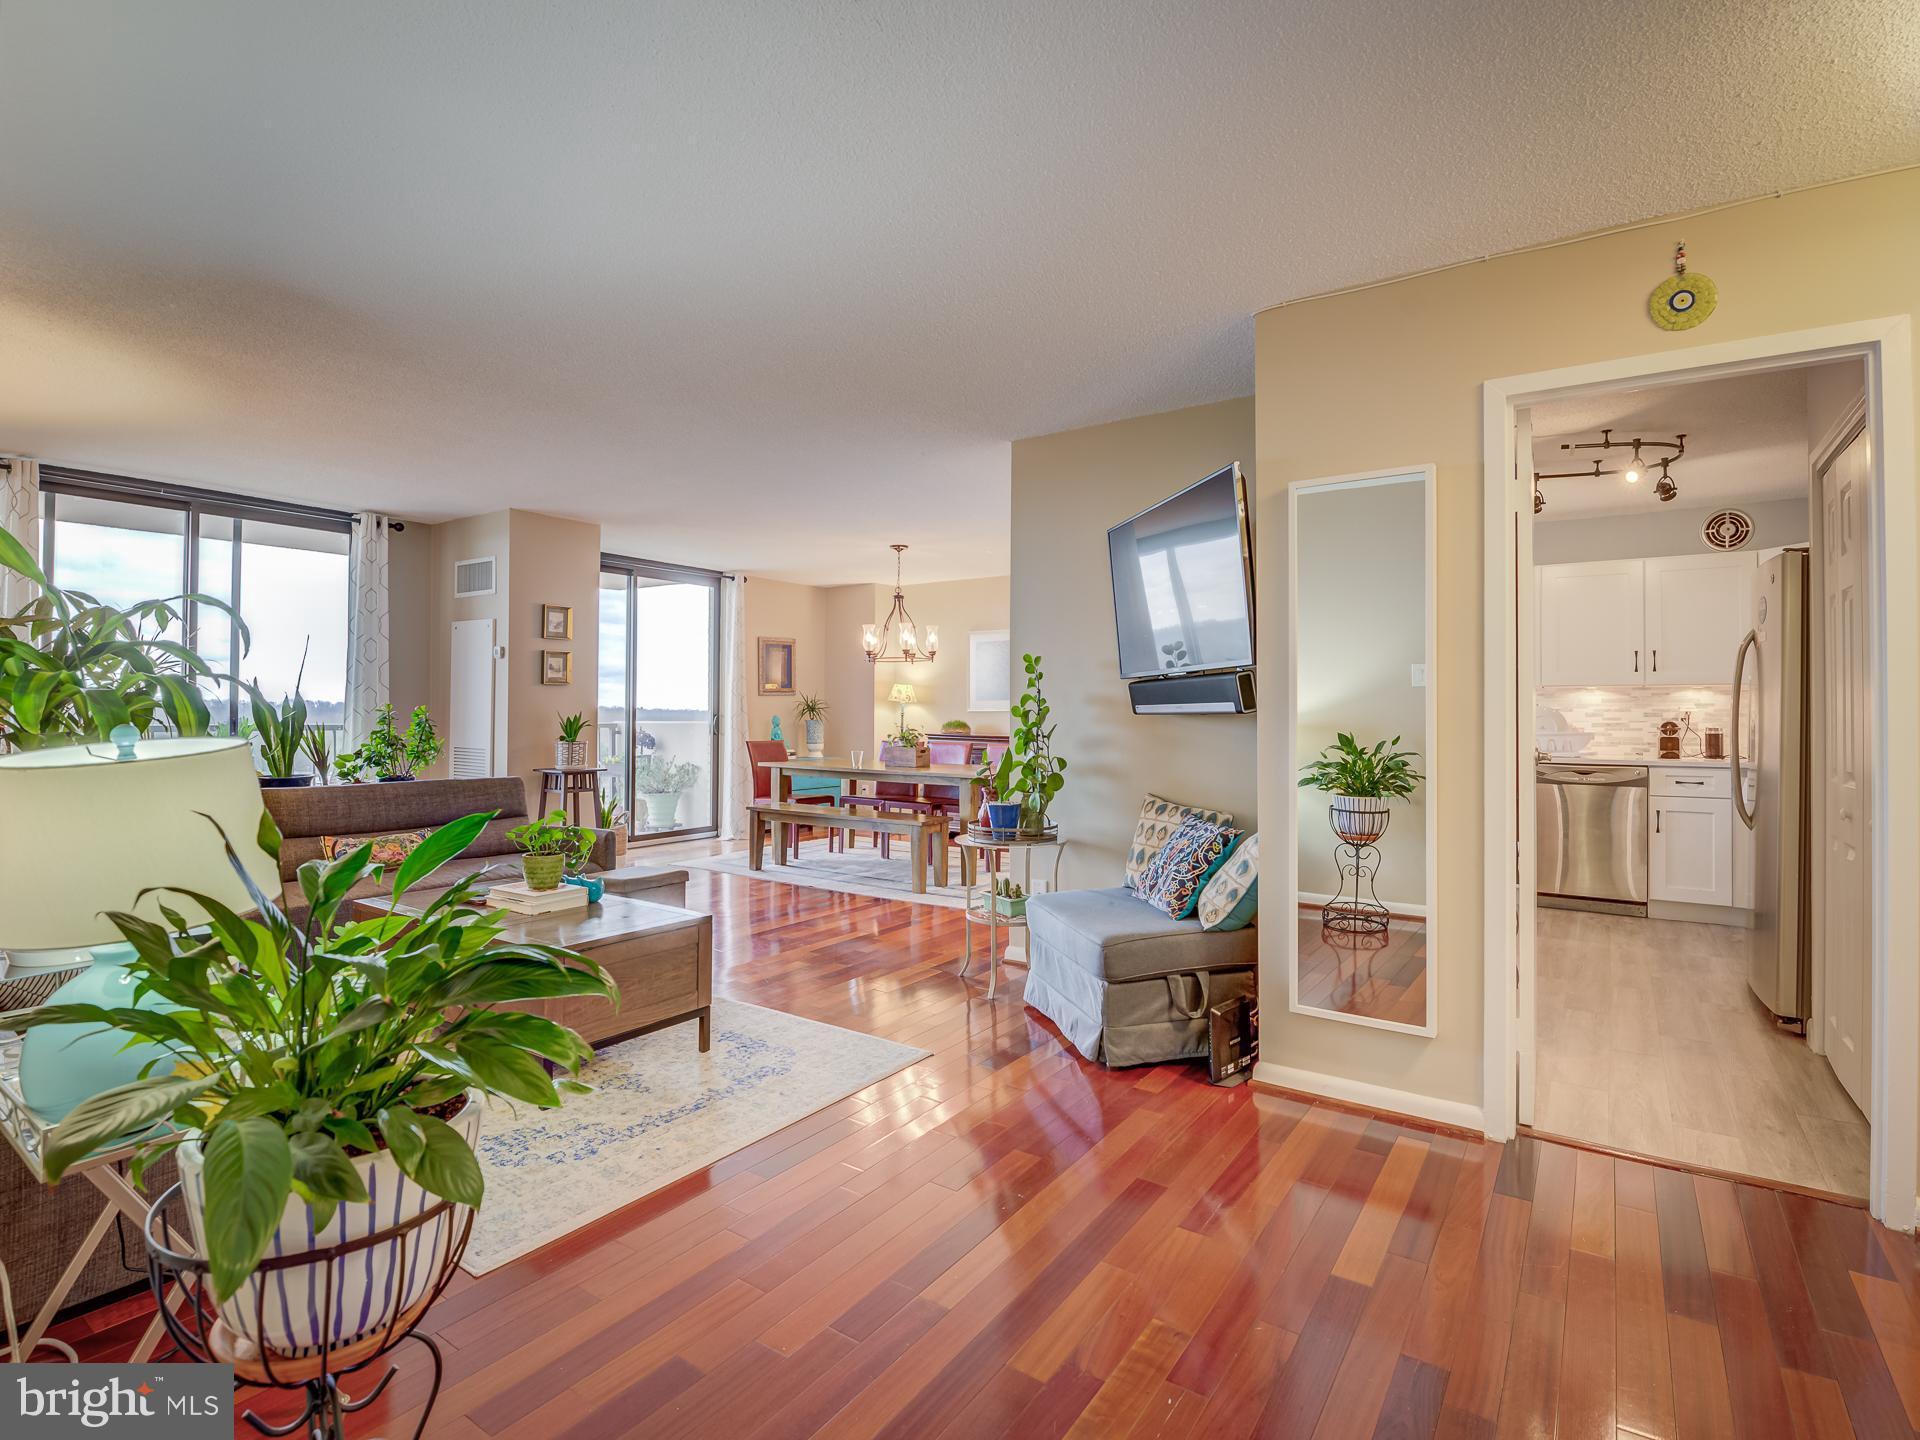 7420 WESTLAKE TERRACE, BETHESDA, Maryland 20817, 3 Bedrooms Bedrooms, ,2 BathroomsBathrooms,Condominium,For Sale,7420 WESTLAKE TERRACE,MDMC750020